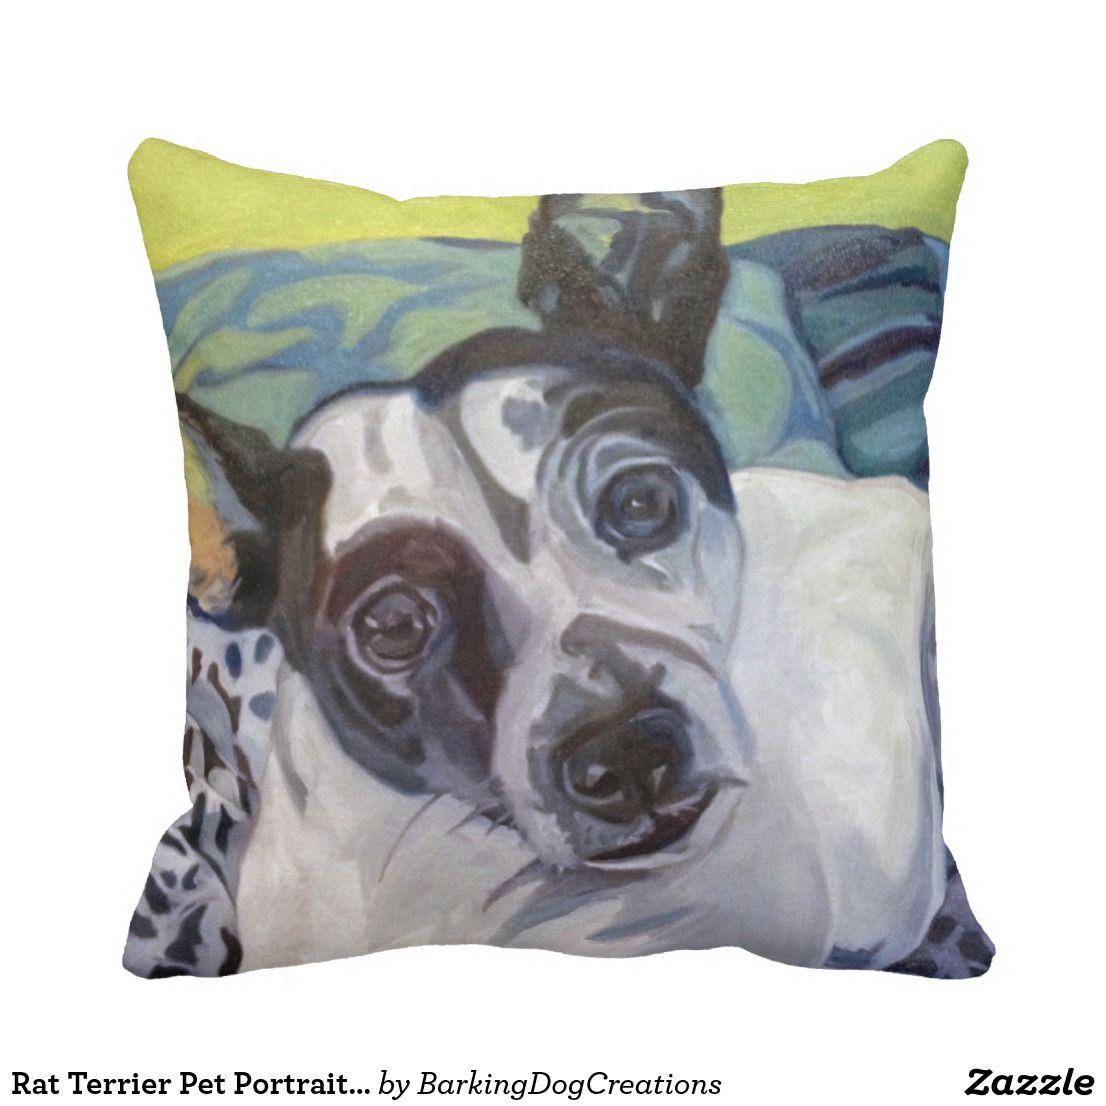 Rat terrier pet portrait pillow pretty pillows pinterest